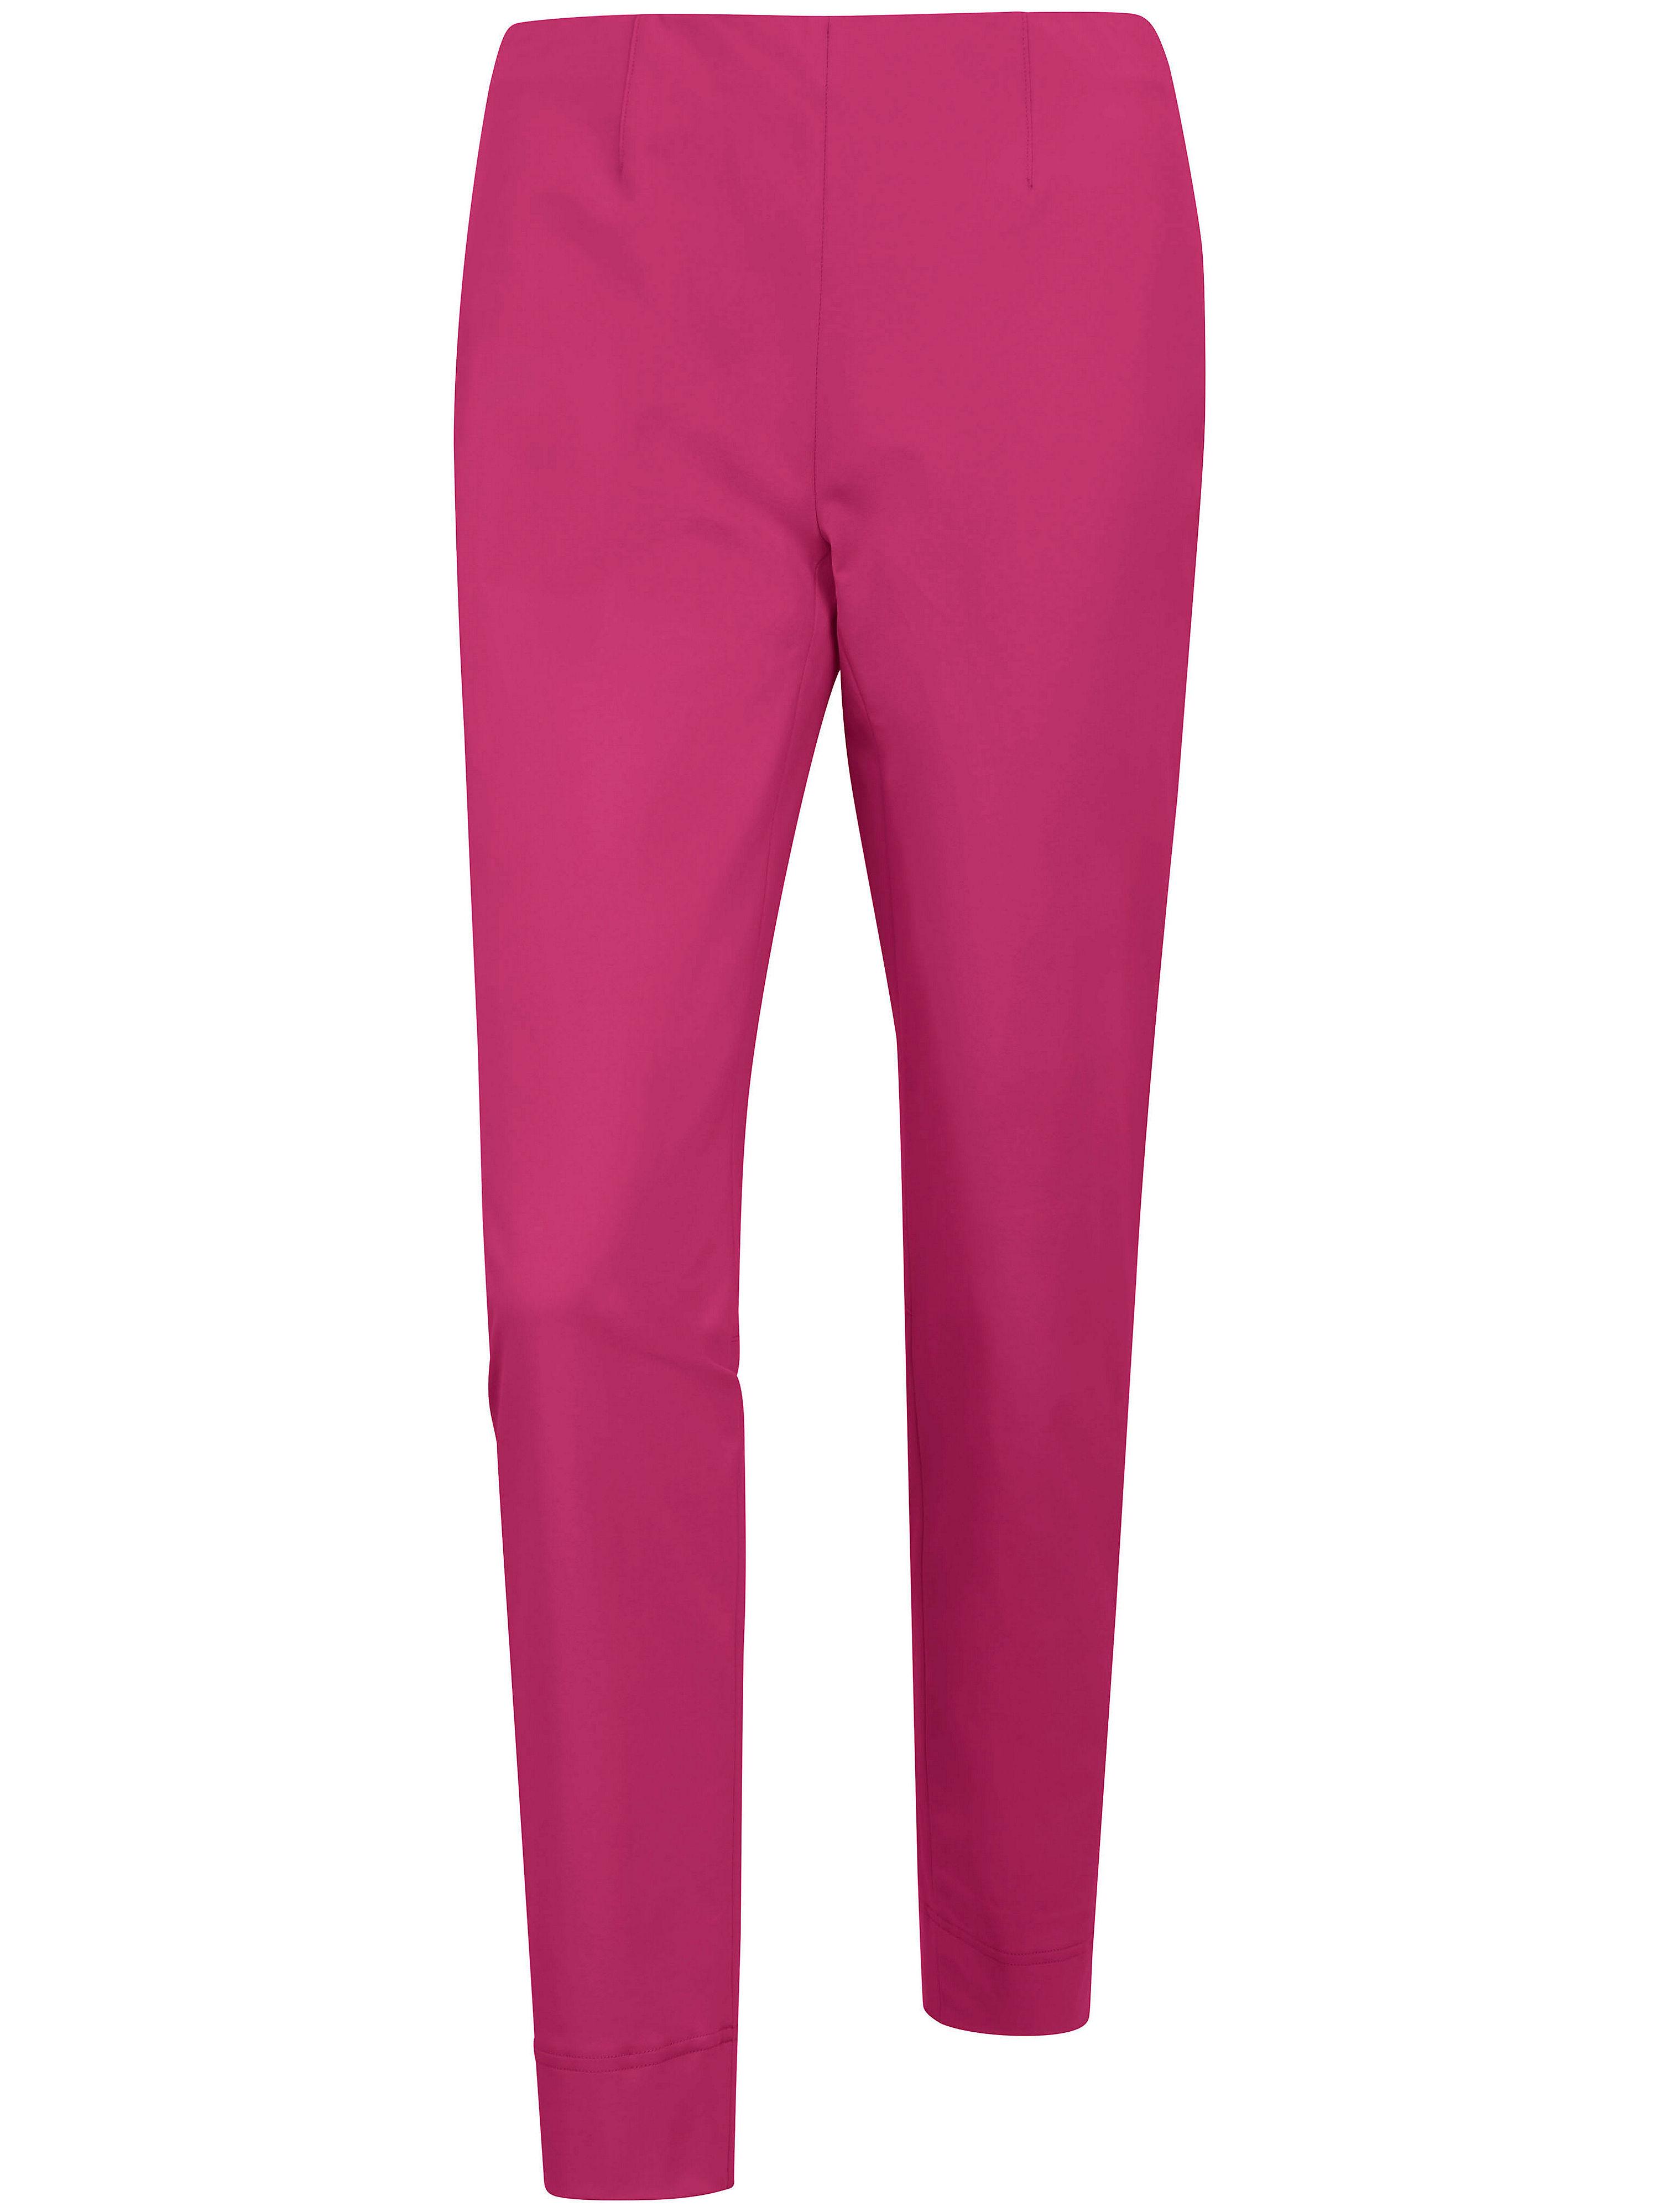 Knöchellange Hose Modell Penny Raffaello Rossi pink